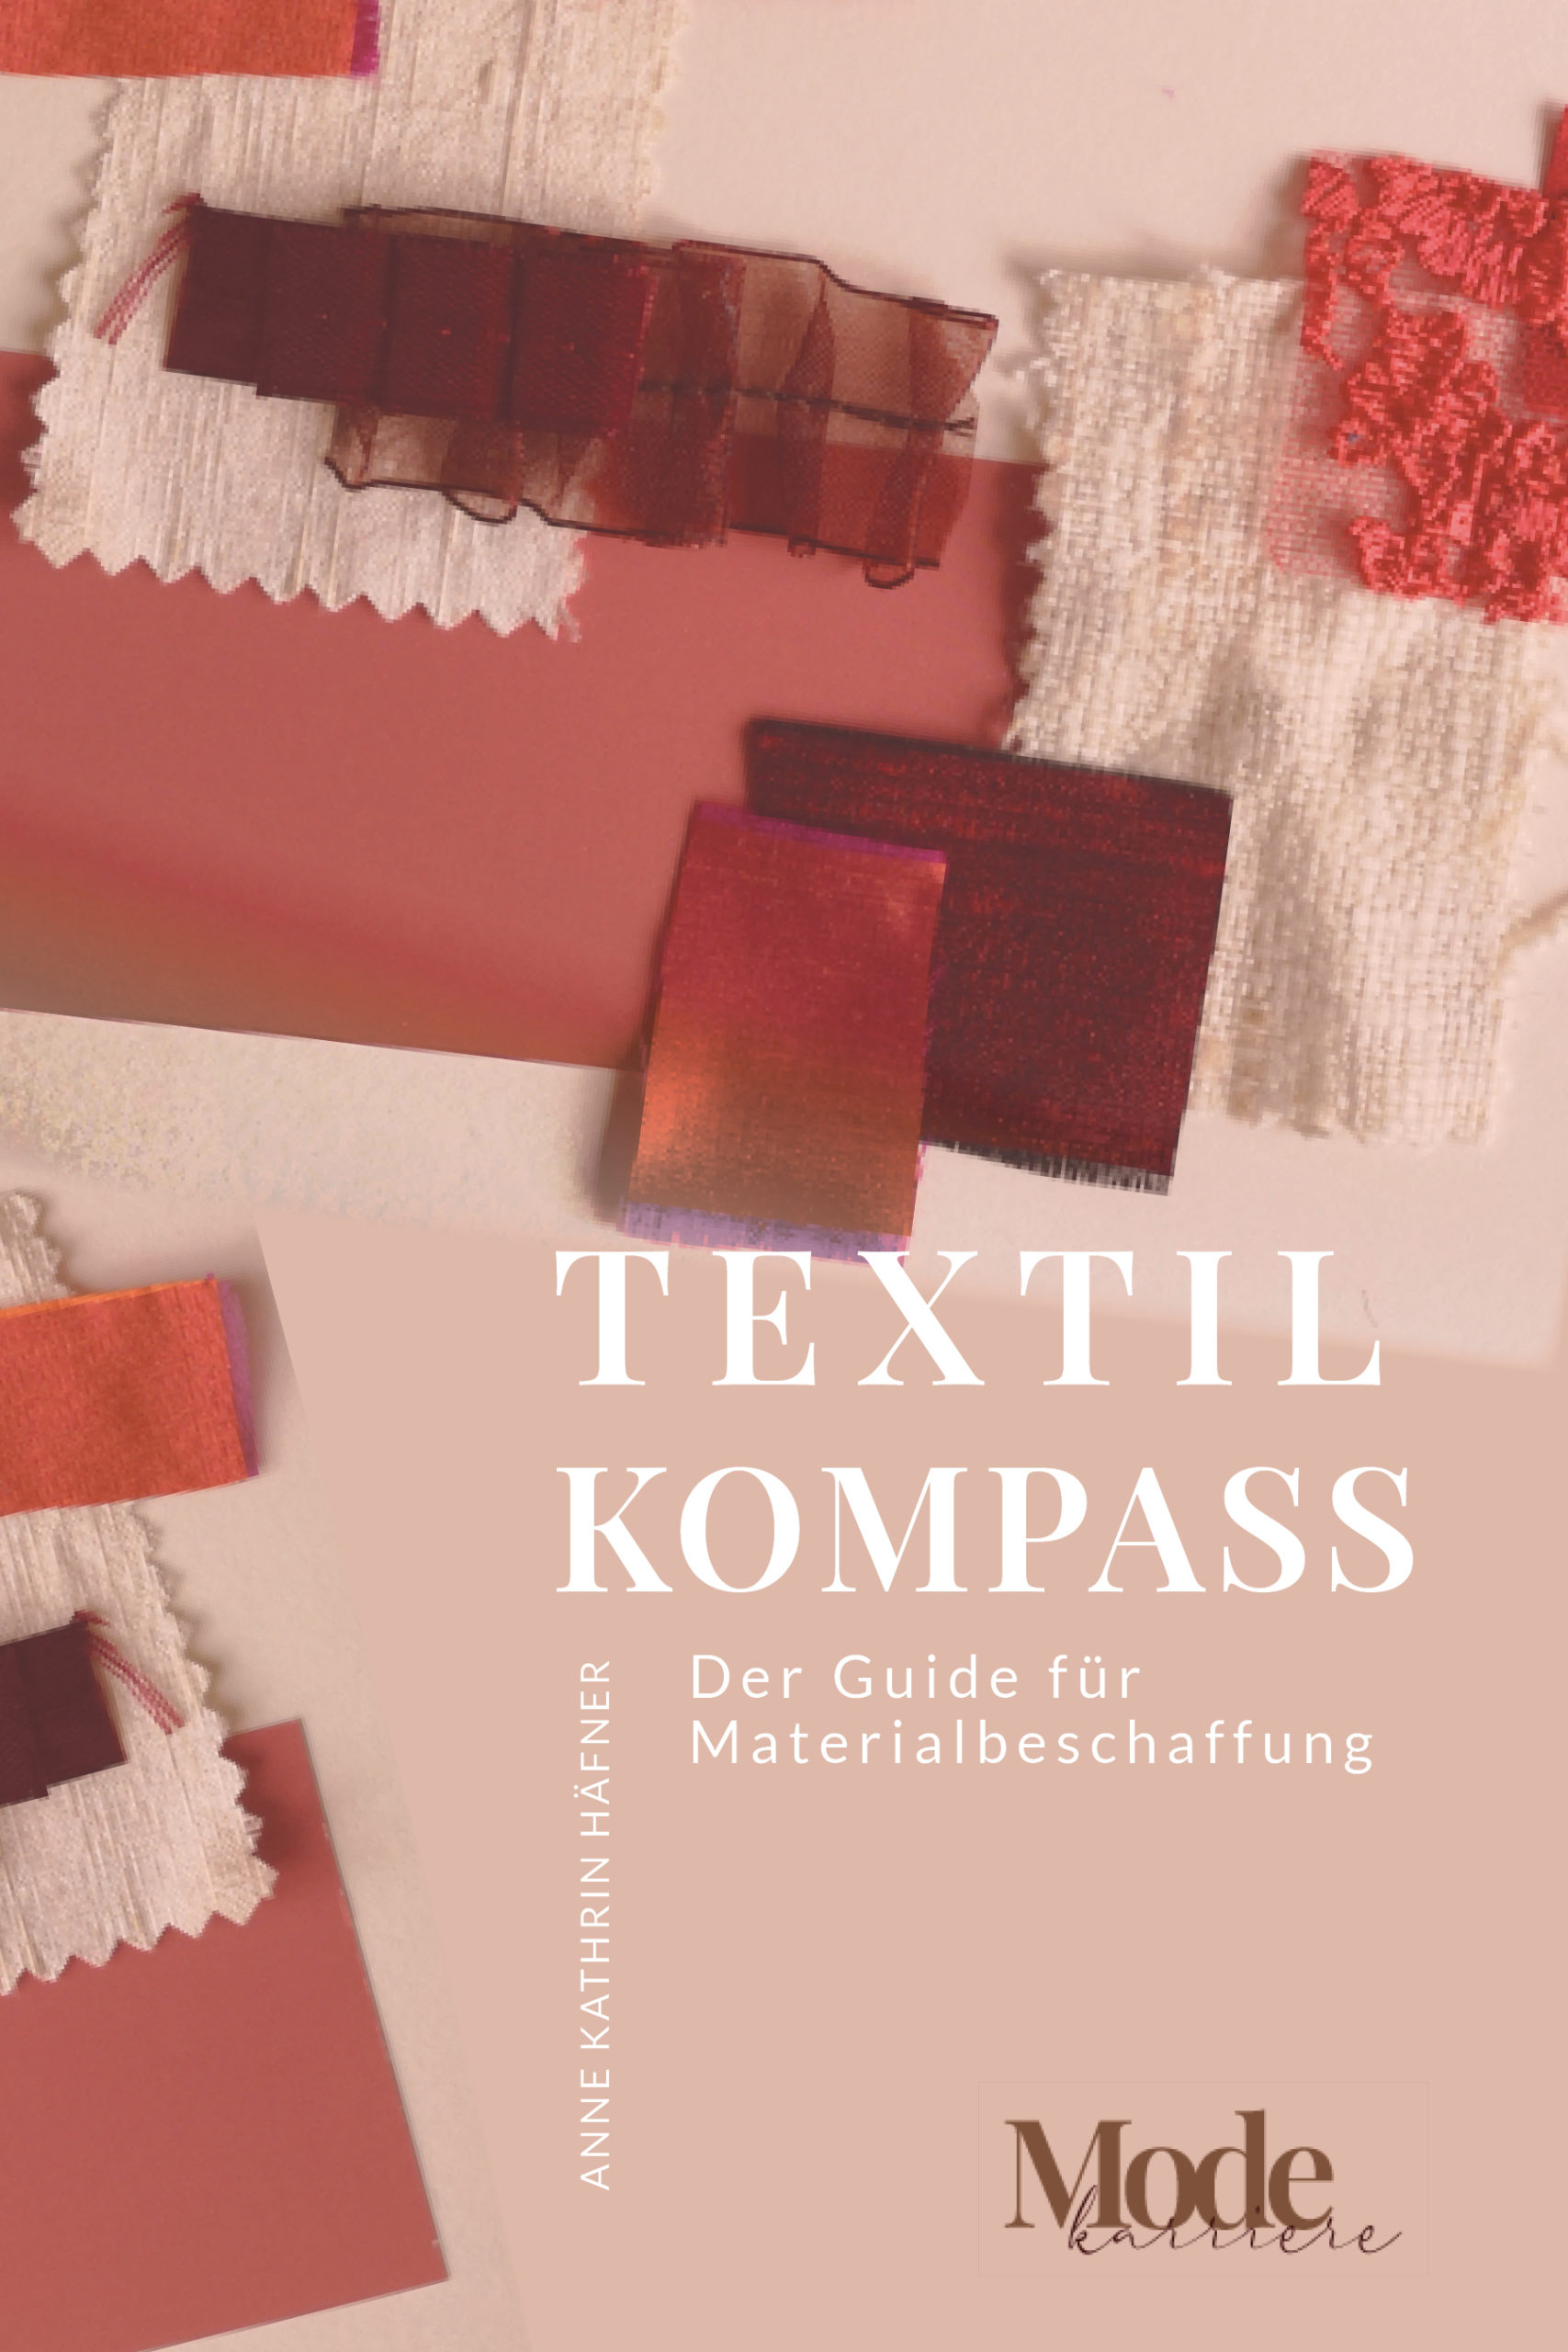 Textilkompass - der Guide für Materialbeschaffung